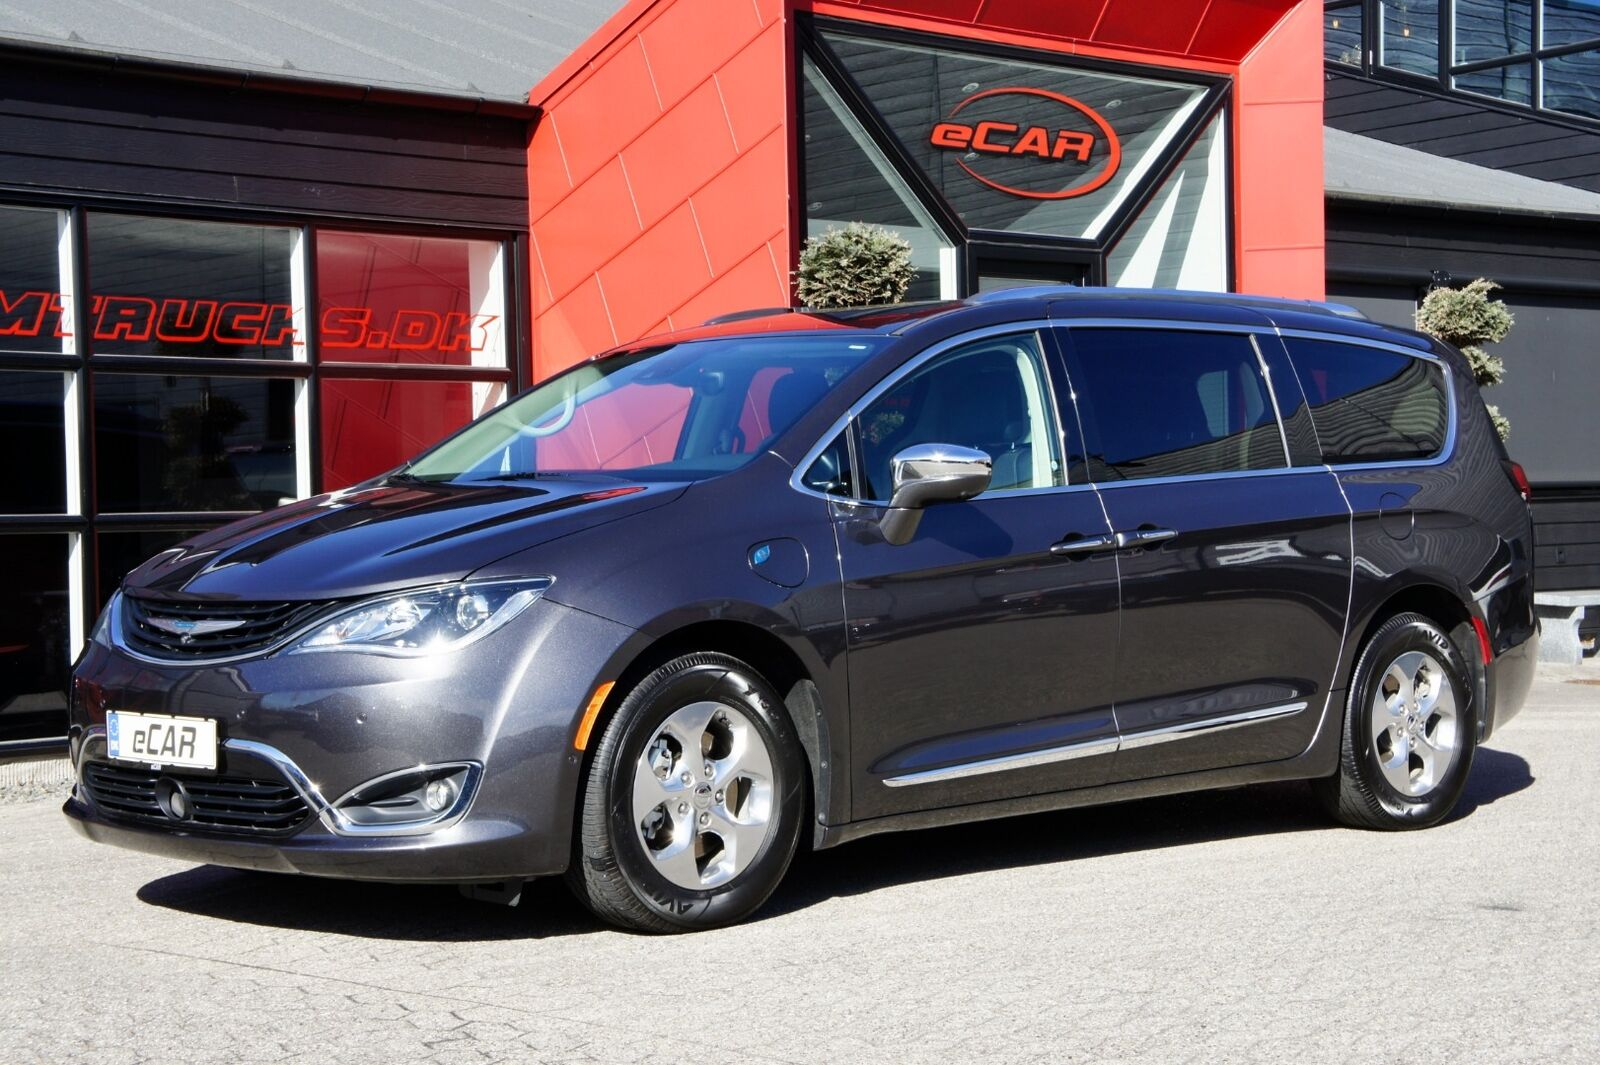 Chrysler Pacifica 3,6 Hybrid Limited aut. 5d - 4.949 kr.